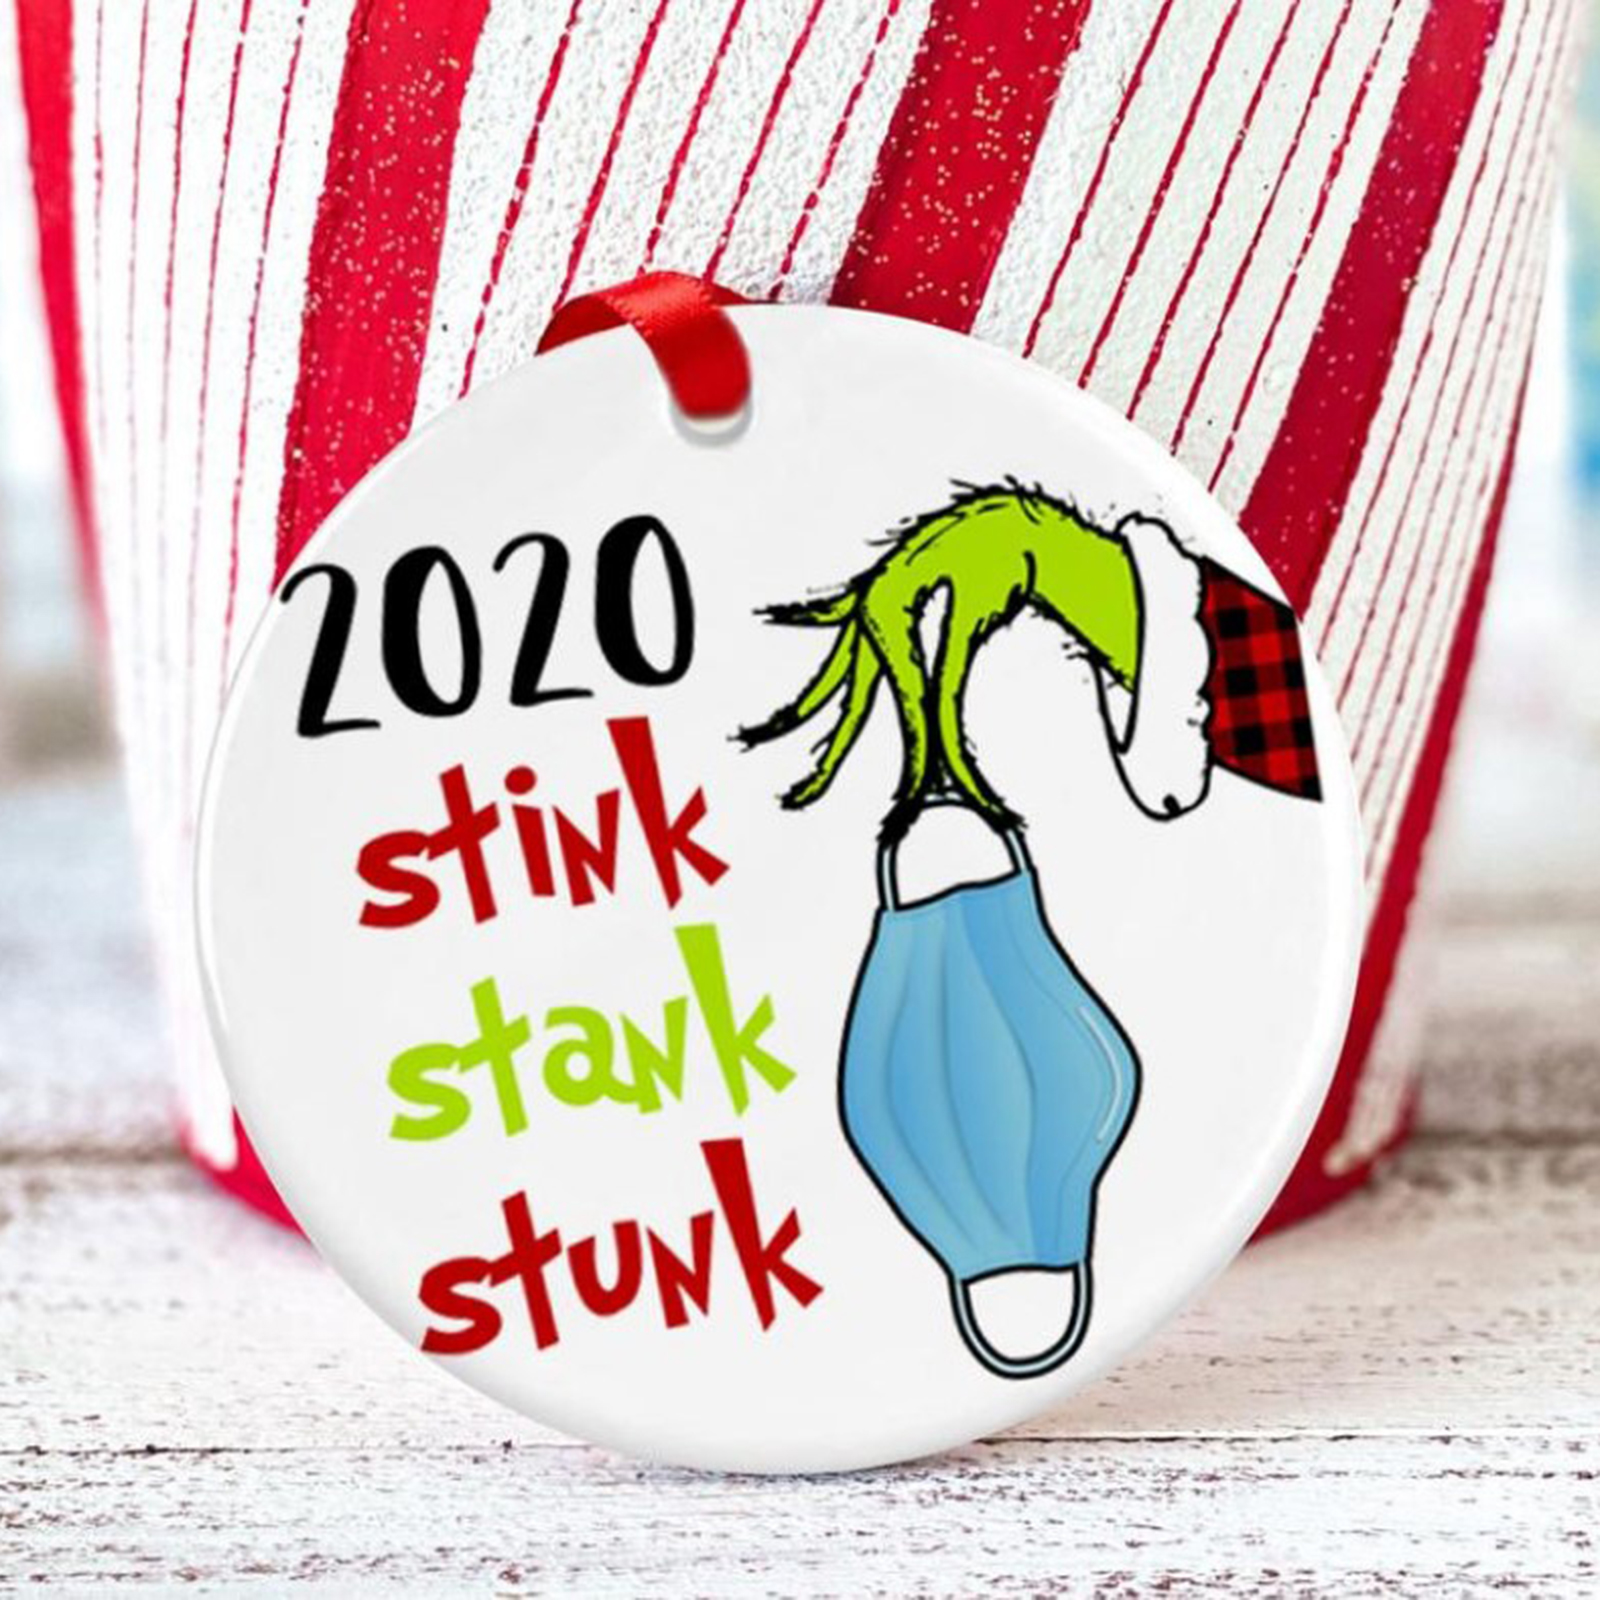 2020 Stink Stank Stunk Mask Ornament, Grinch Hand Christmas Ornament, Christmas Hanging Decoration